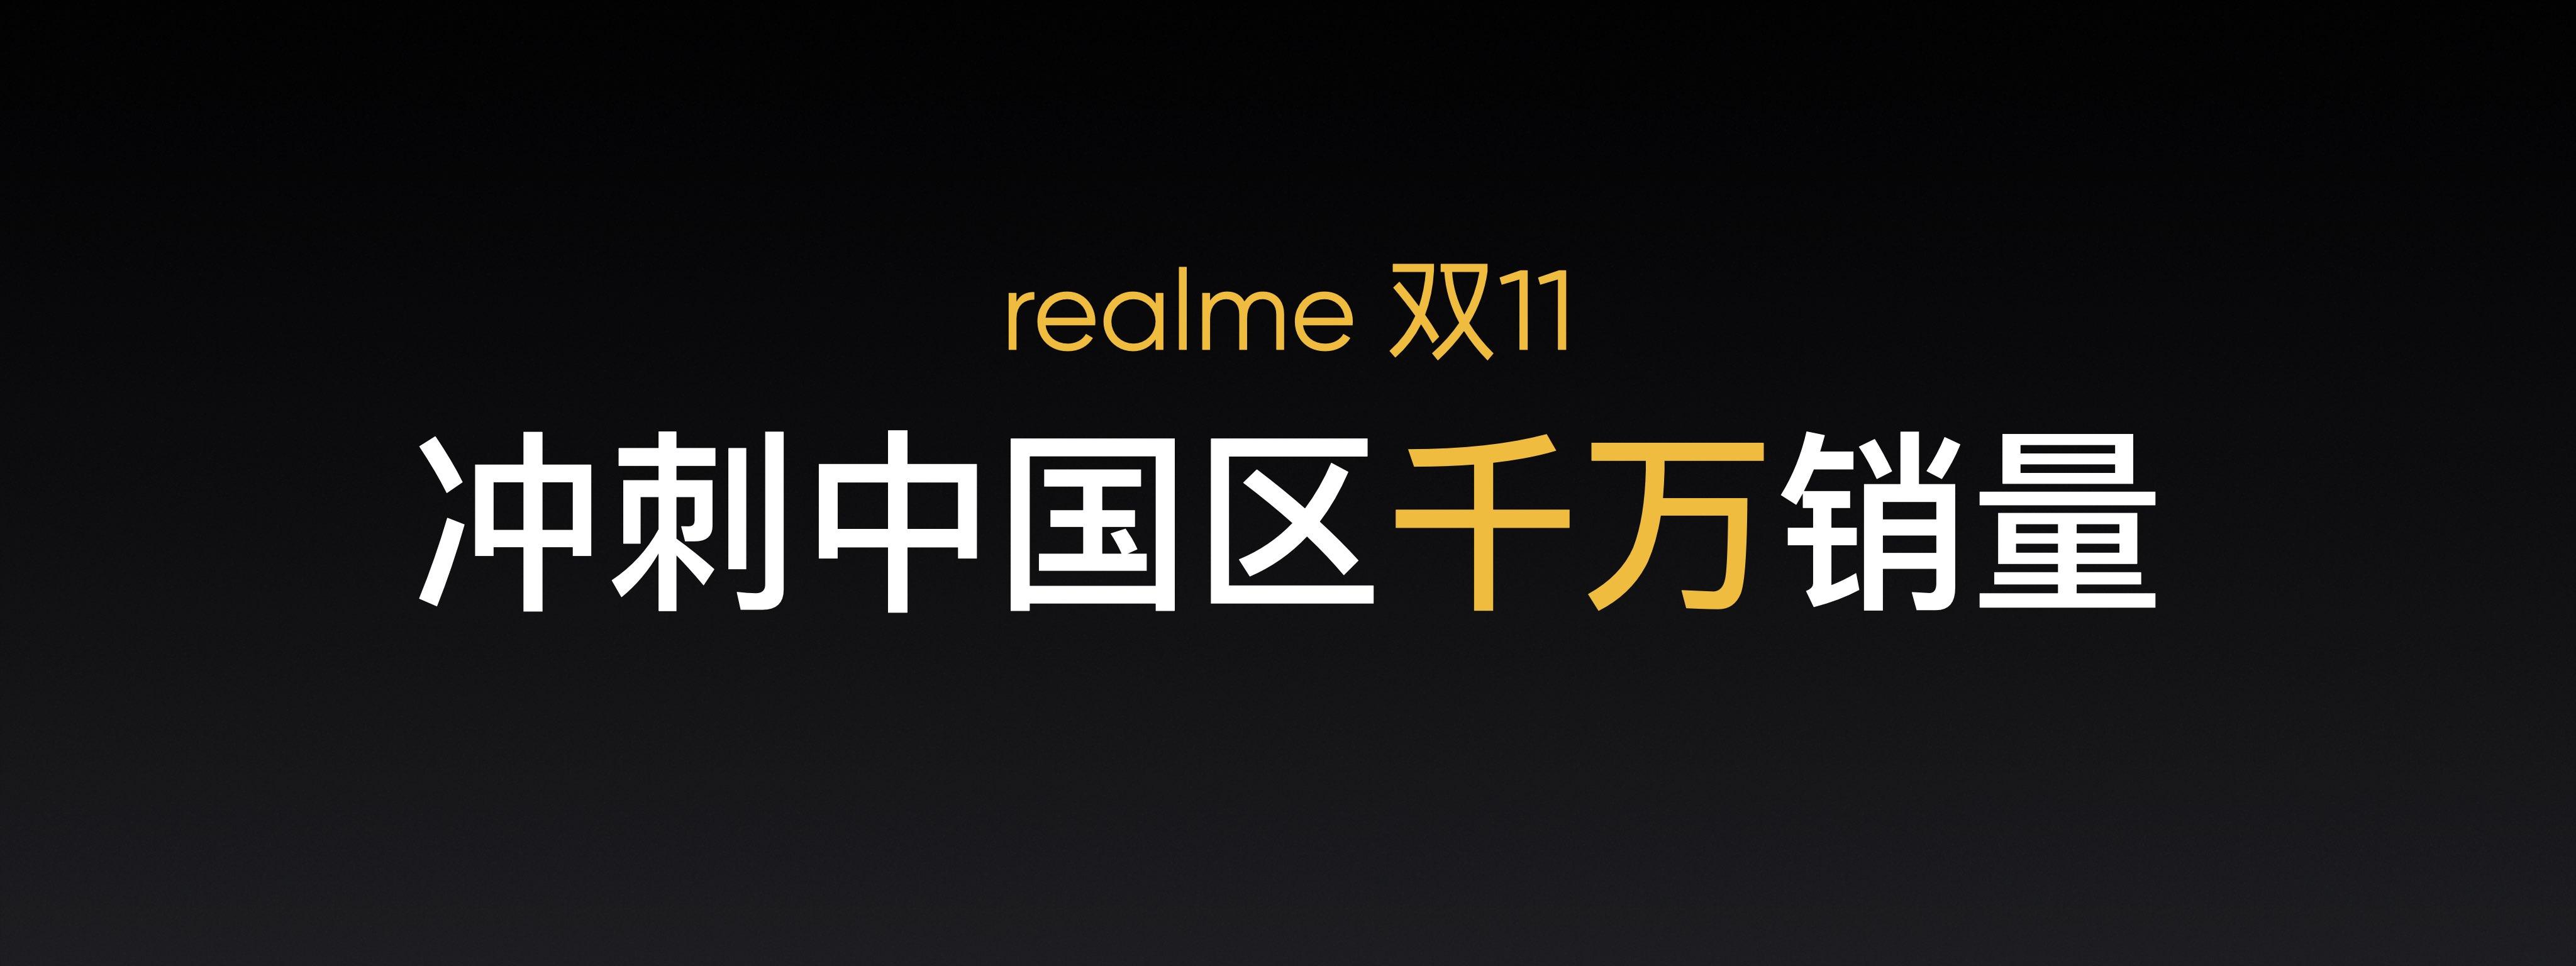 realme首款手表真我T1发布,1+5+T生态链战略更进一步